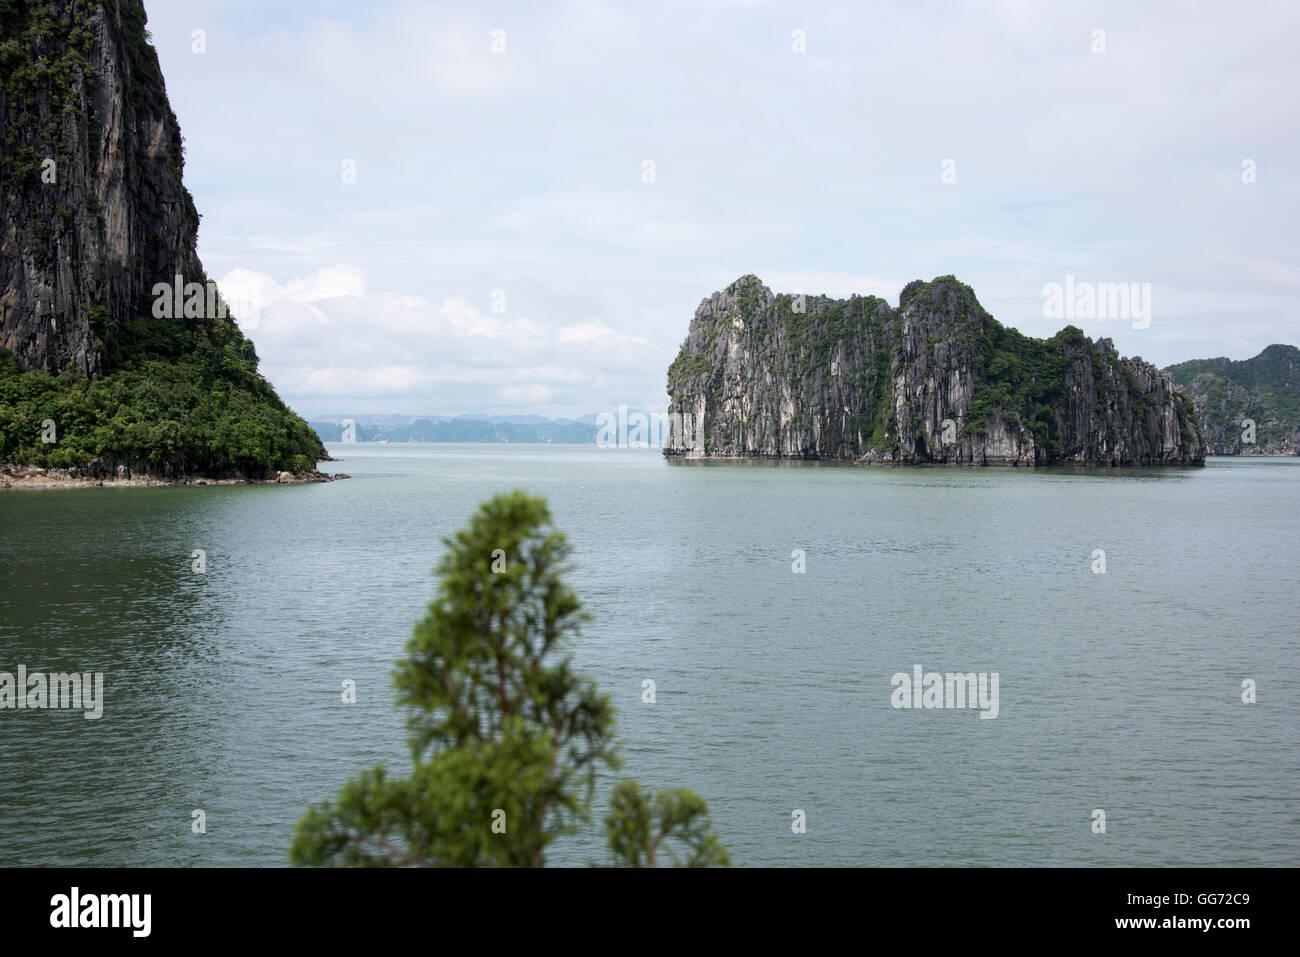 Islands in Ha Long Bay, north Vietnam. - Stock Image